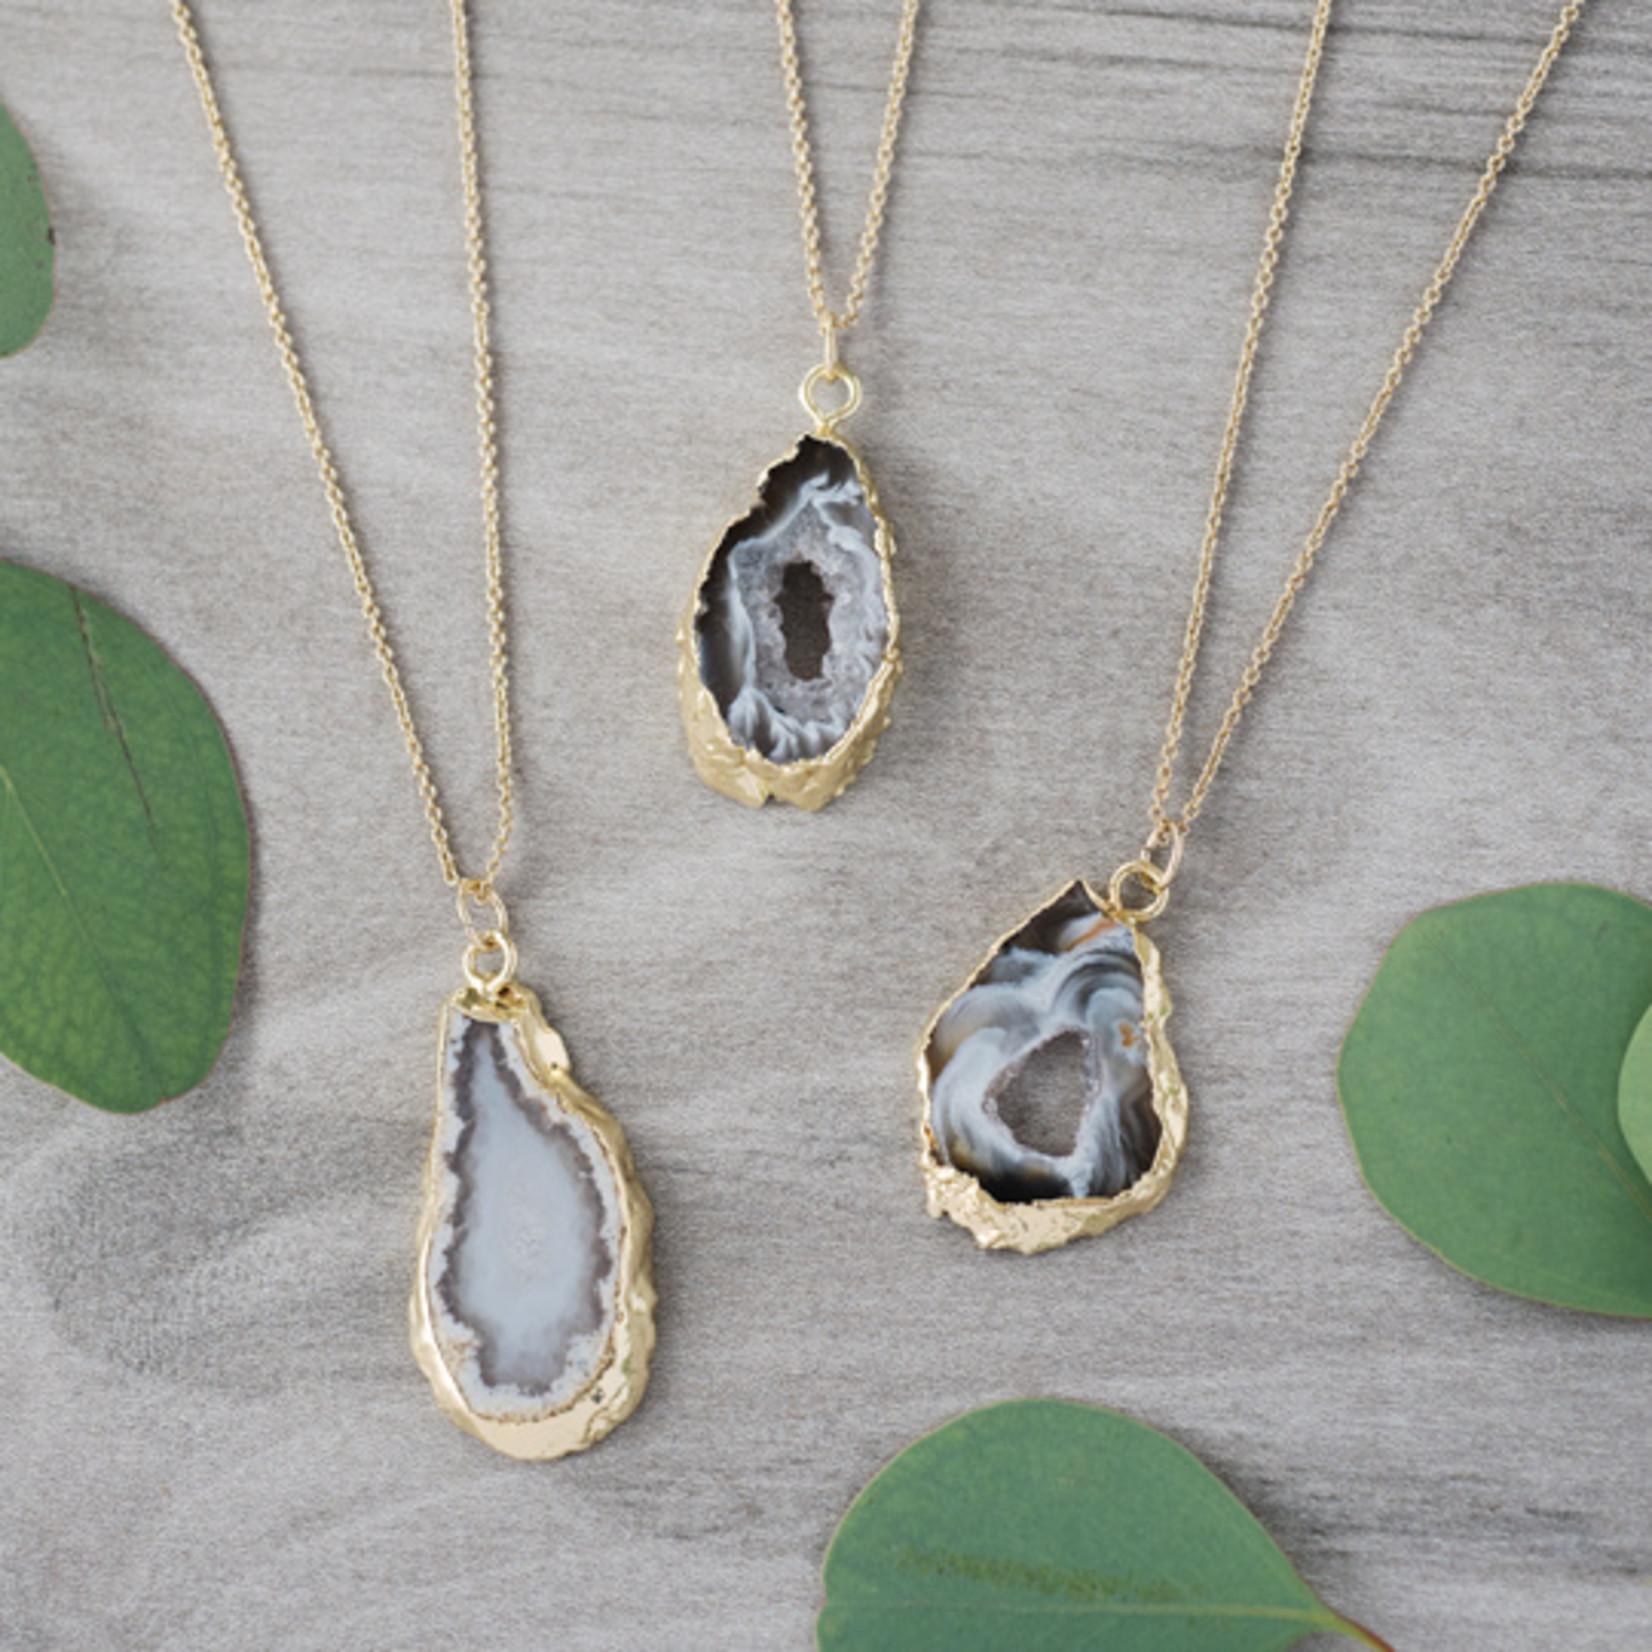 Glee Jewelry ~ Desire Necklace